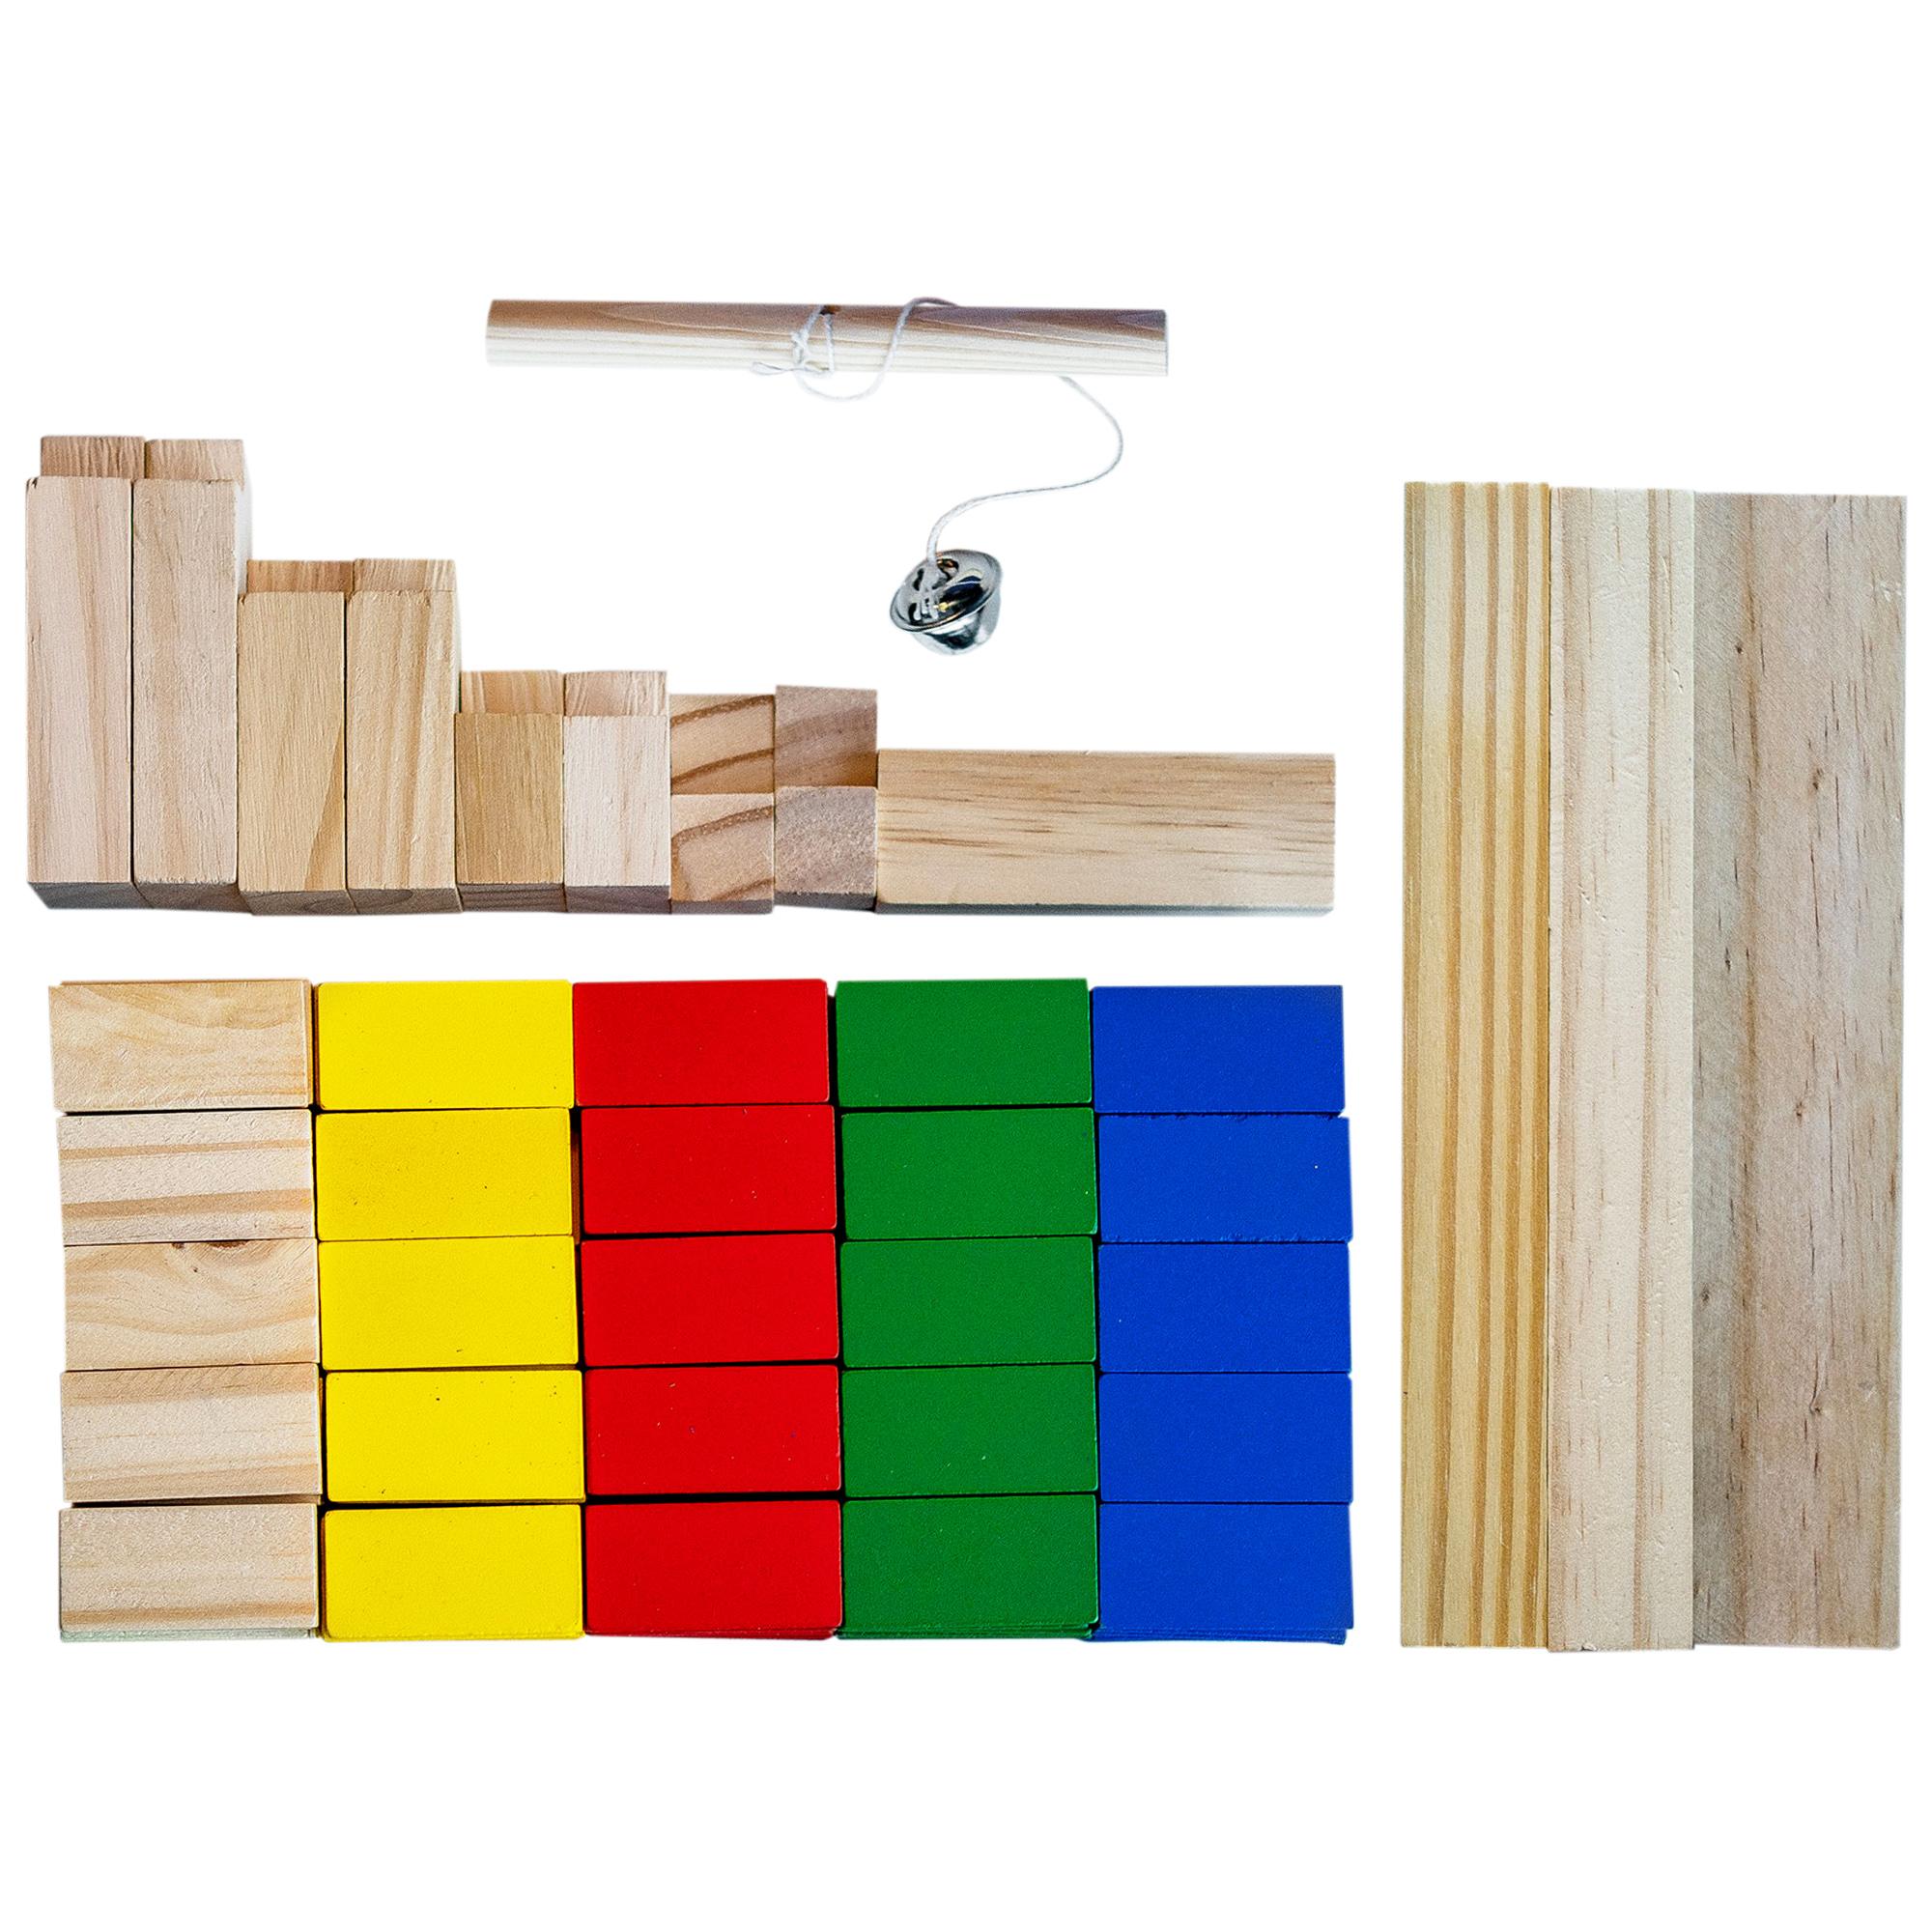 Holz Bausteine - 263 Stück